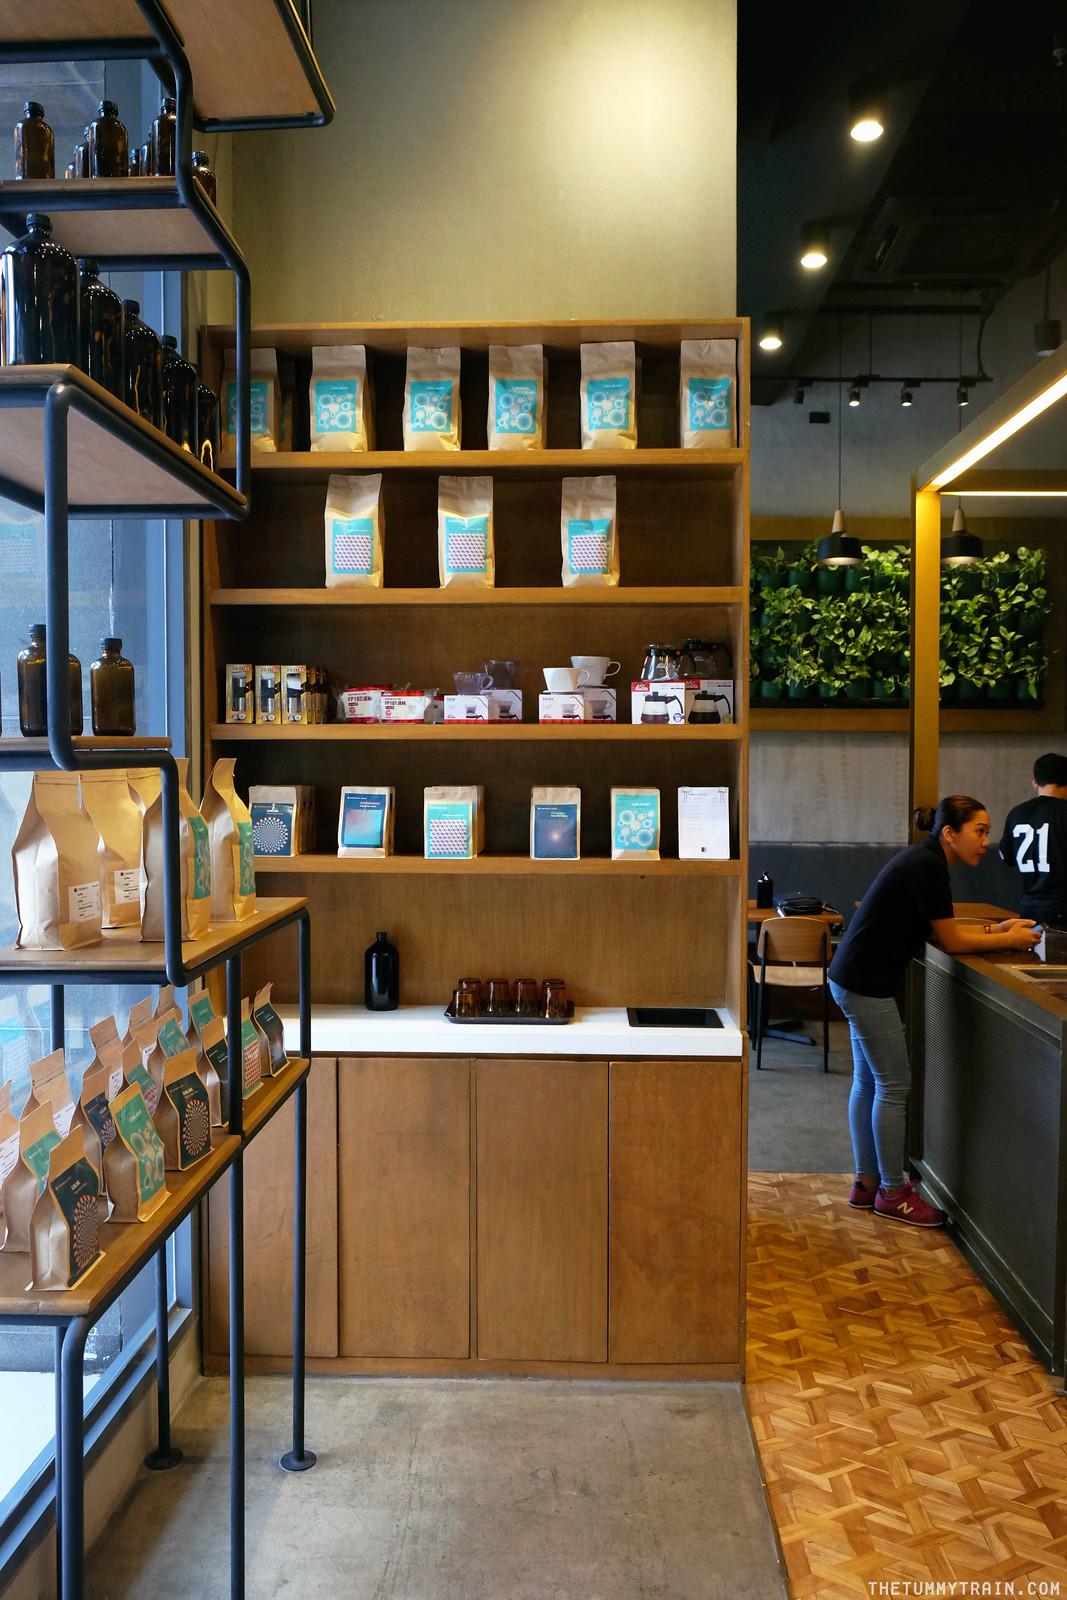 31075018176 de087d86c0 h - A Fundamental Coffee break in Park Terraces Tower Makati